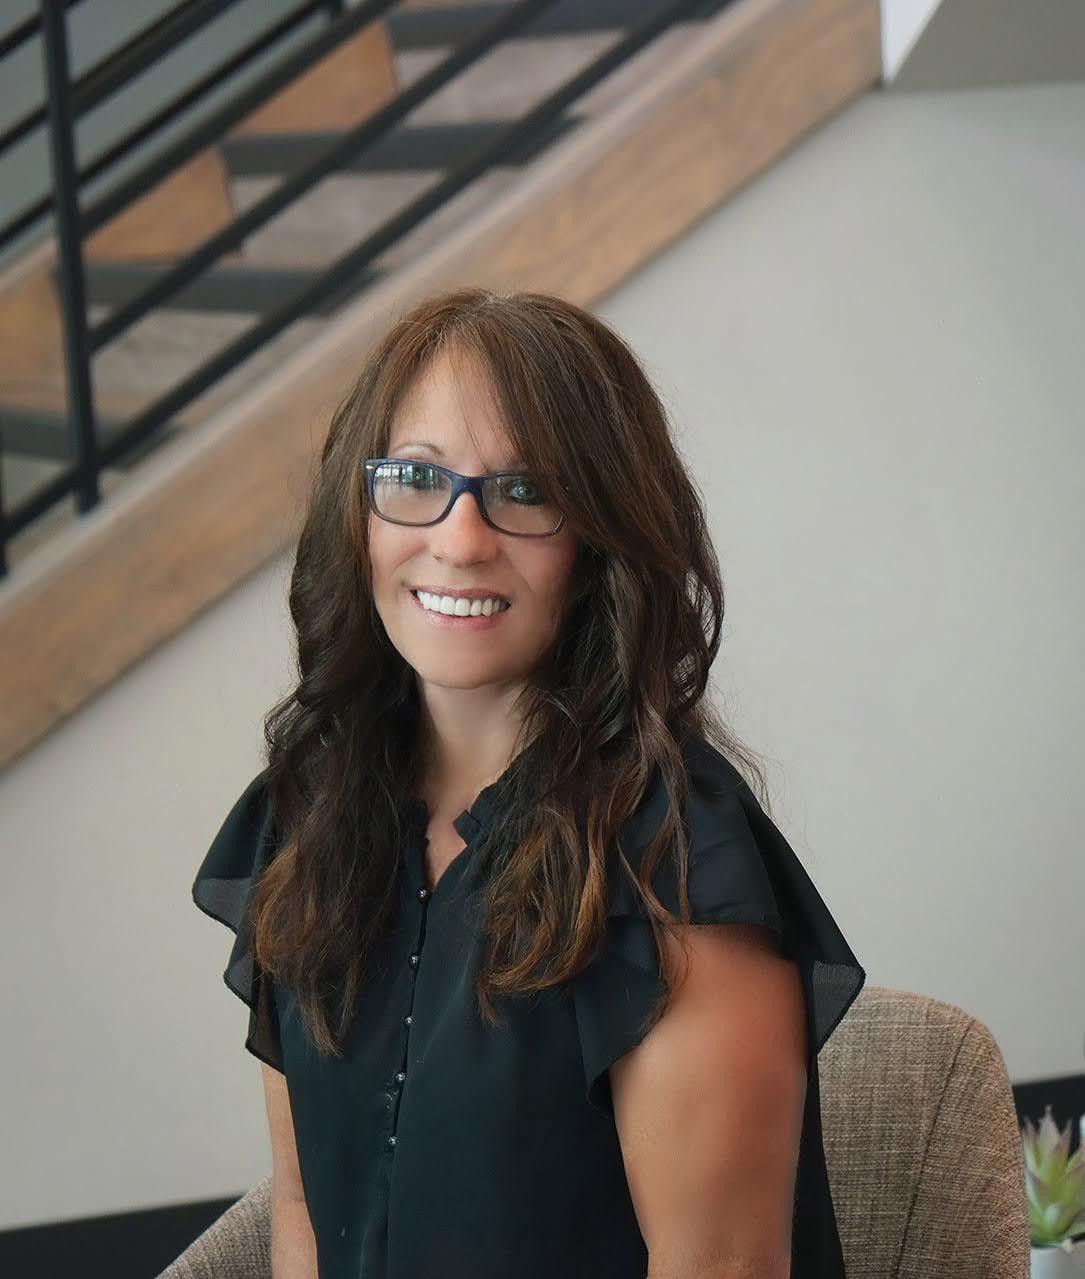 Kathy Dengler